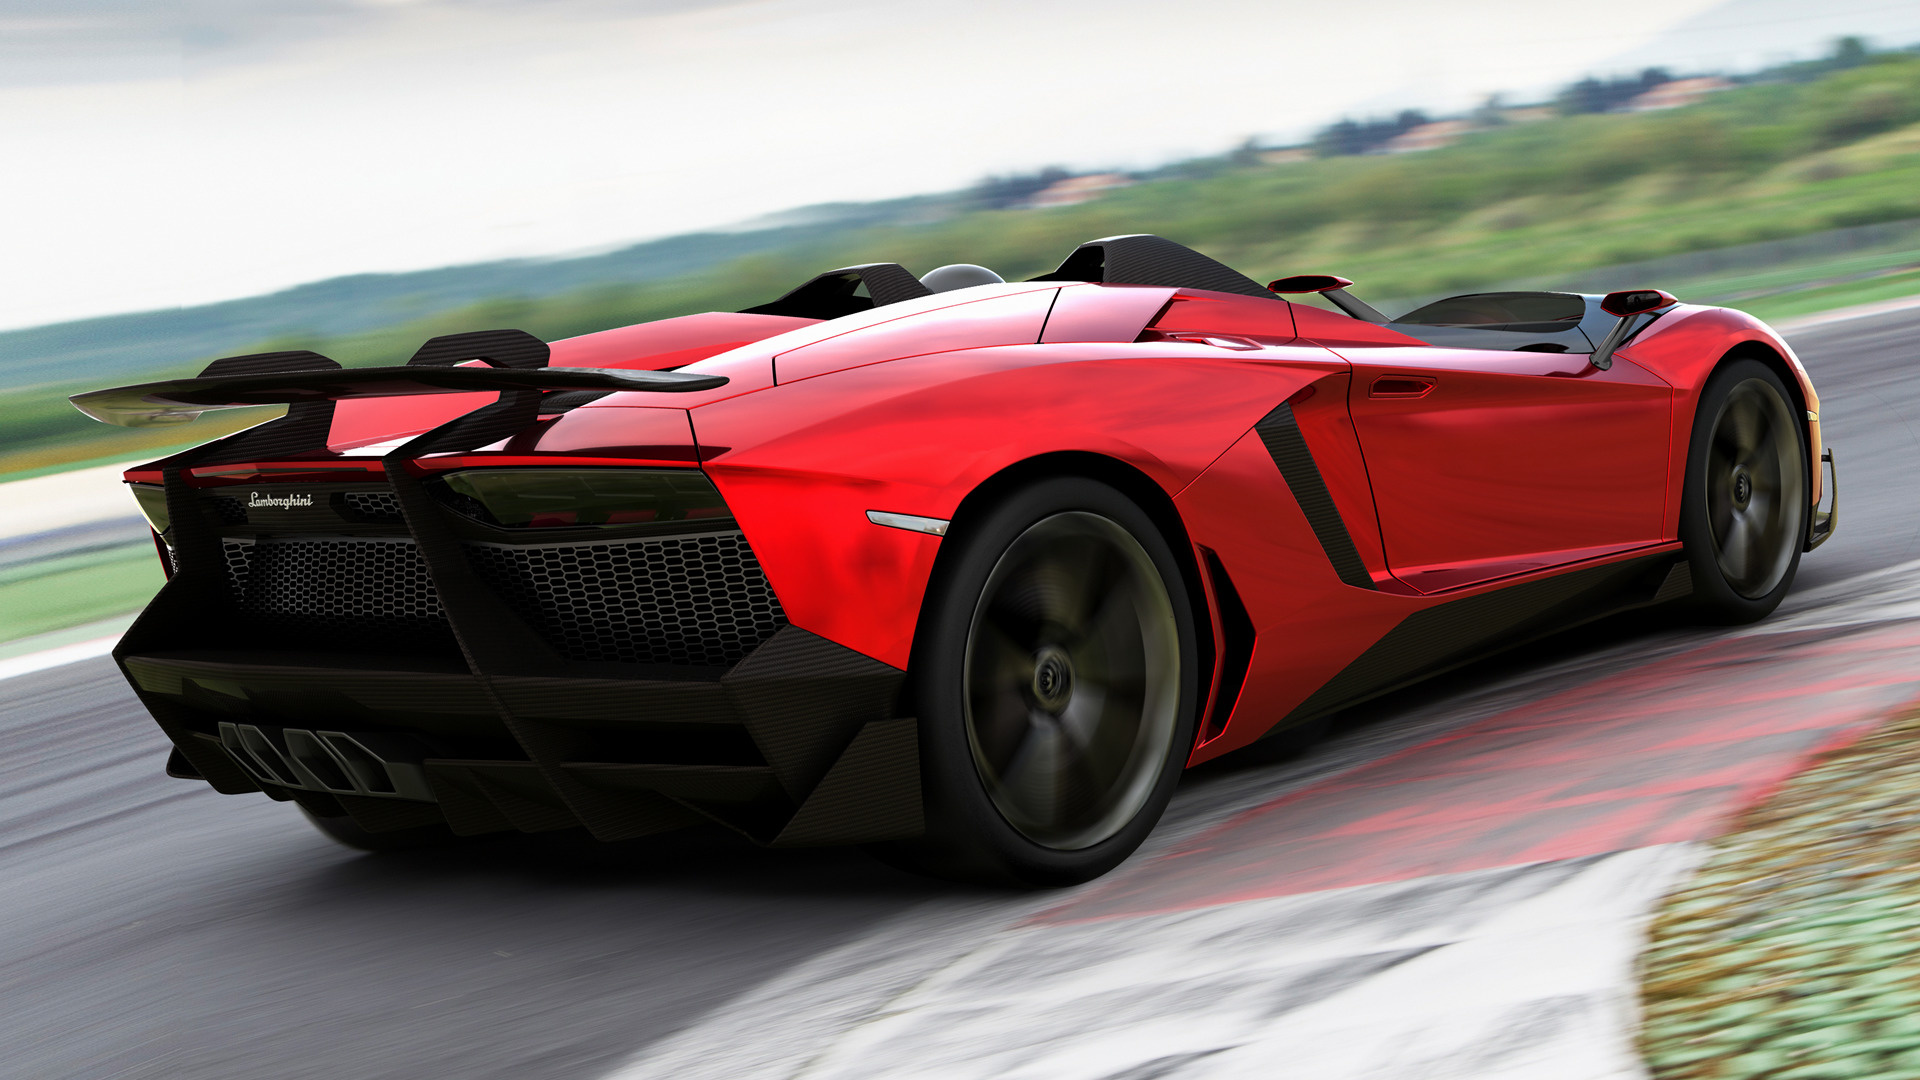 Lamborghini Aventador J (2012) Wallpapers and HD Images ...